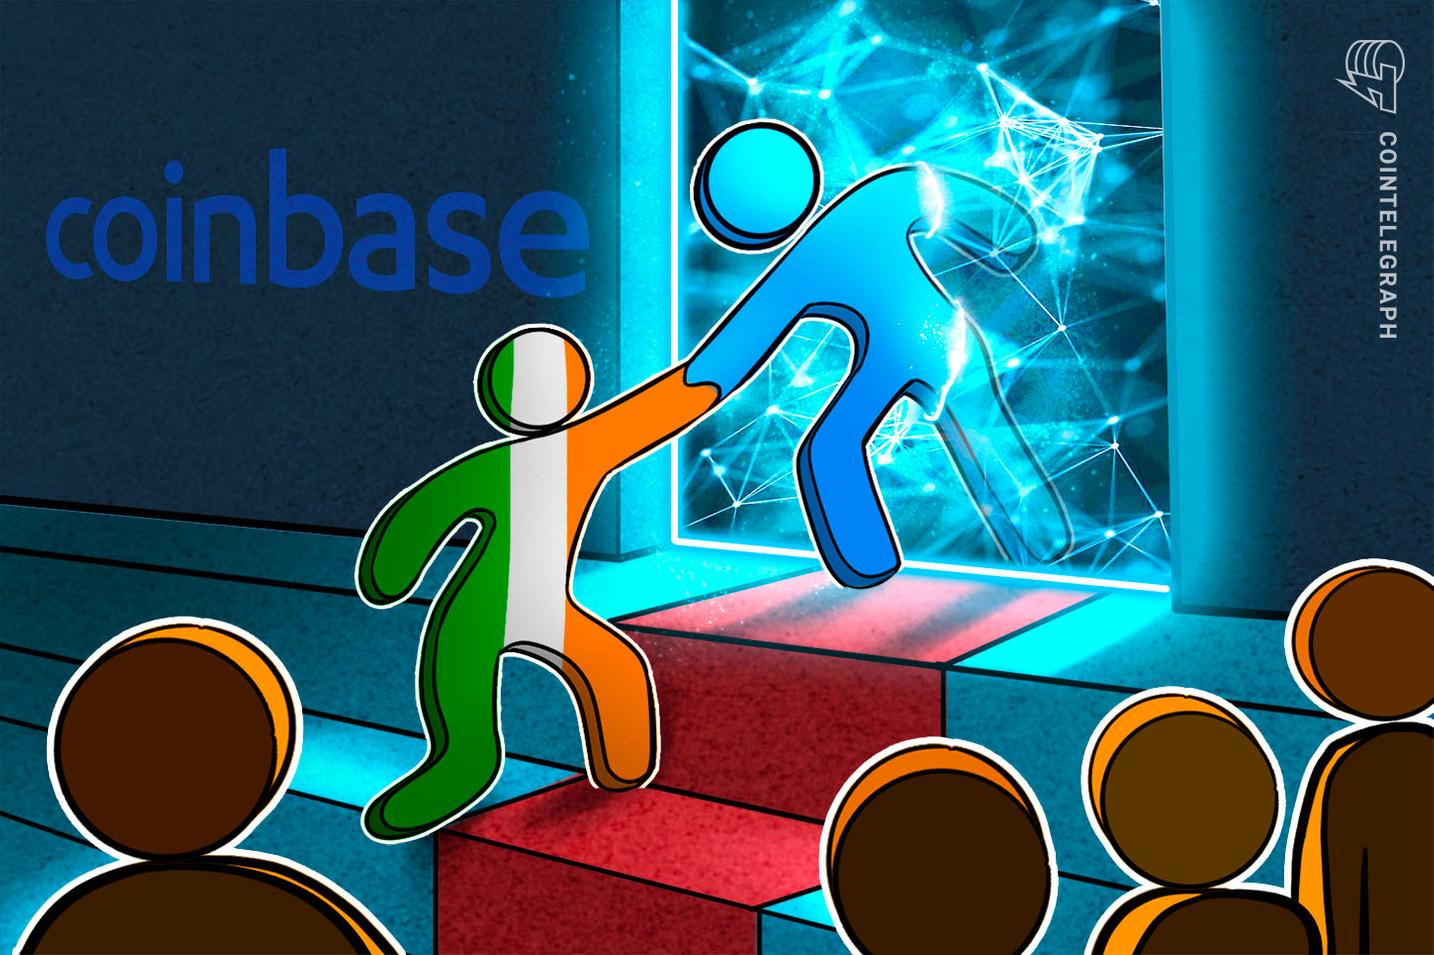 Coinbase lanza una división de custodia de criptomonedas internacional